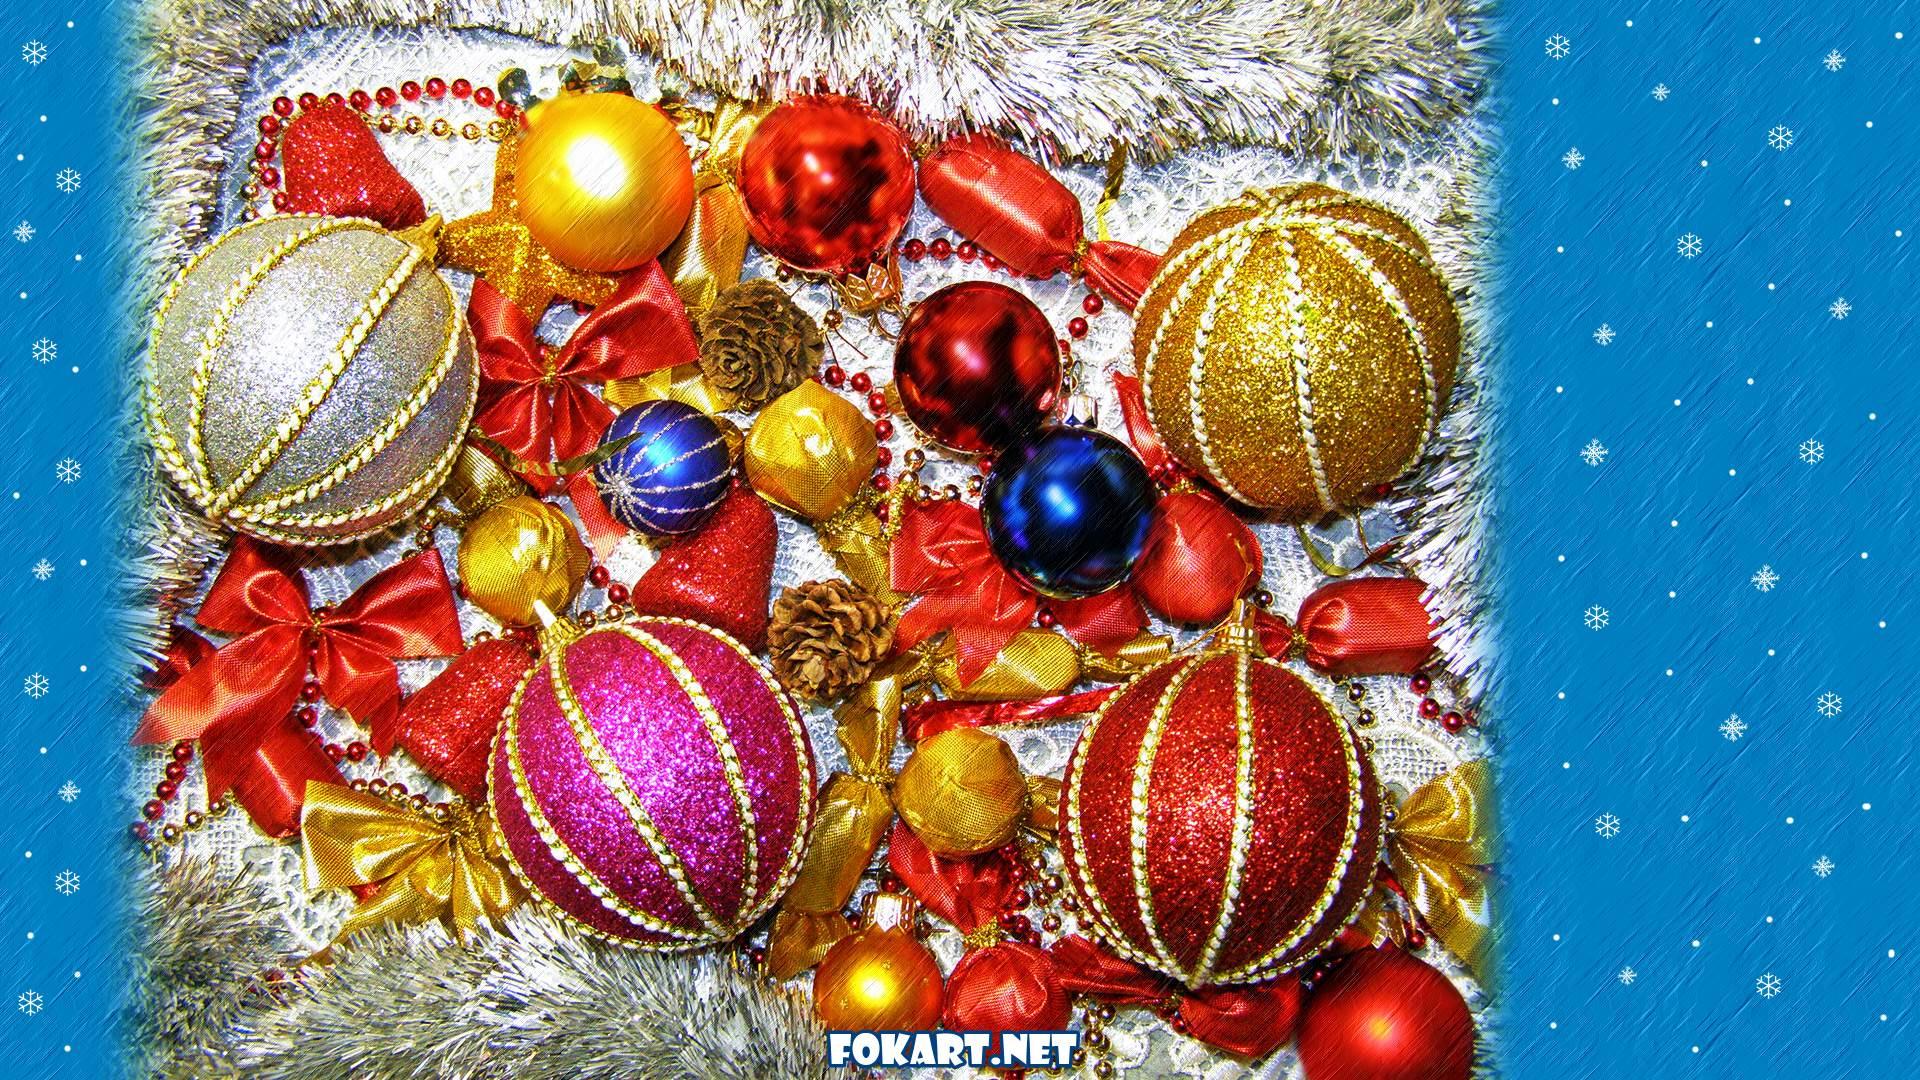 Новогодние яркие шарики и бантики и фон со снежинками